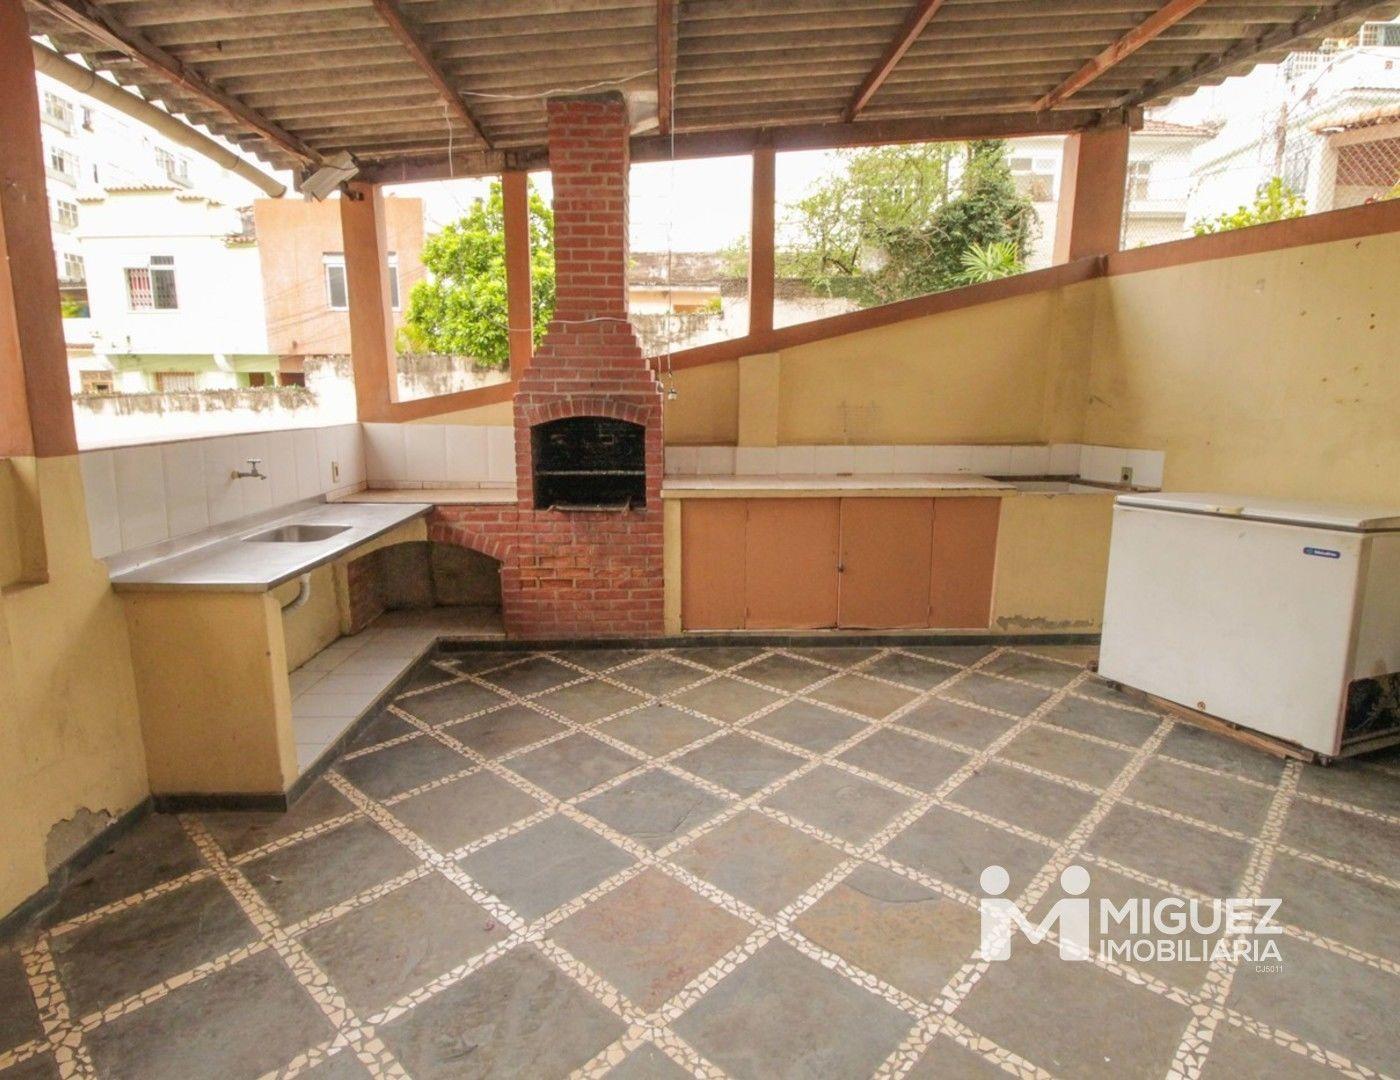 Apartamento, aluguel, Rua Haddock Lobo - Tijuca , Rio de janeiro